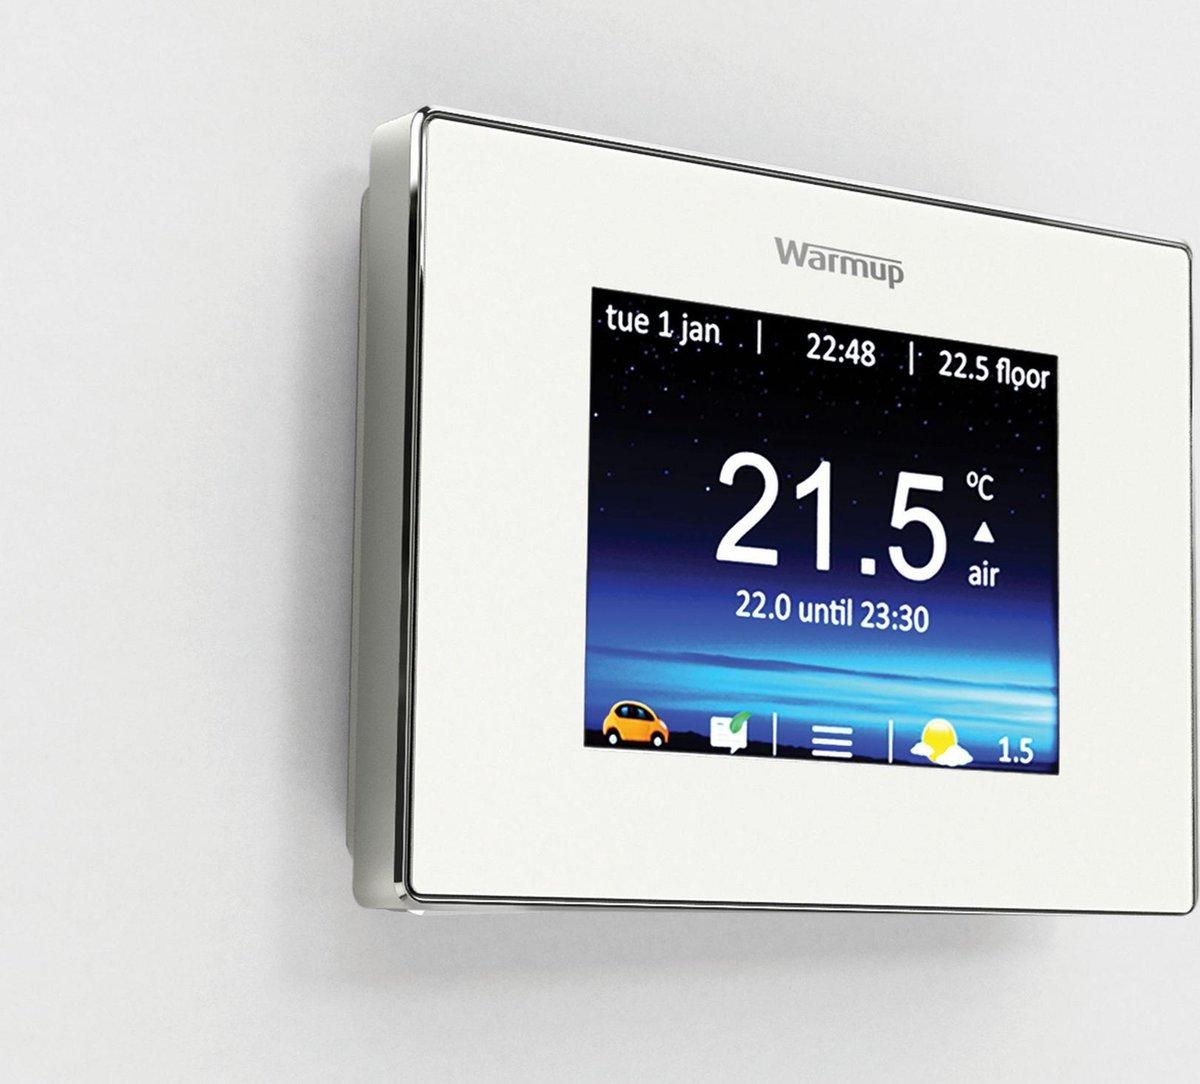 4iE Smart Wifi Thermostaat Elektrische vloerverwarming | Kleur: Cloud White | Warmup